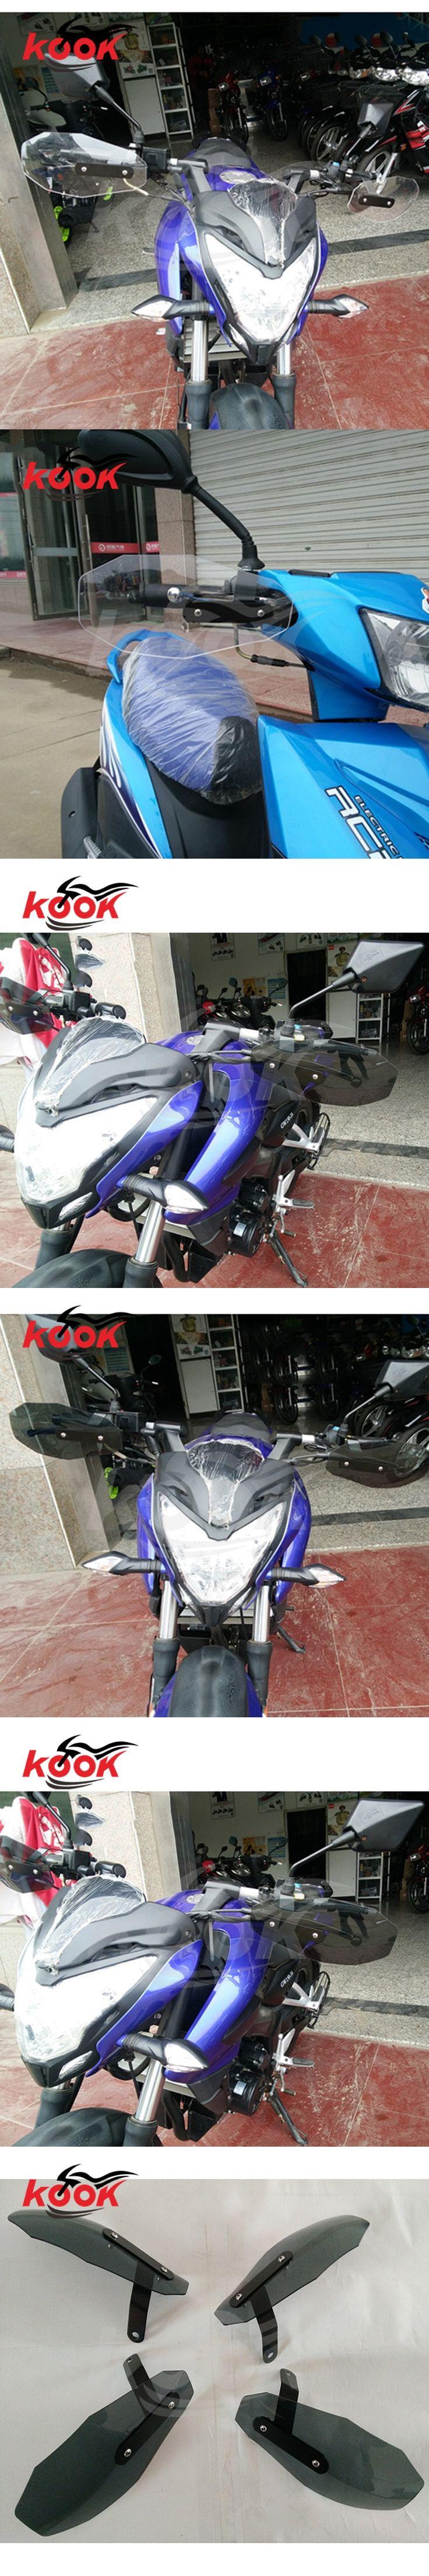 transparent ATV Off-road dirt pit bike Protection moto hand guard for kawasaki honda suzuki yamaha harley motorcycle handguard